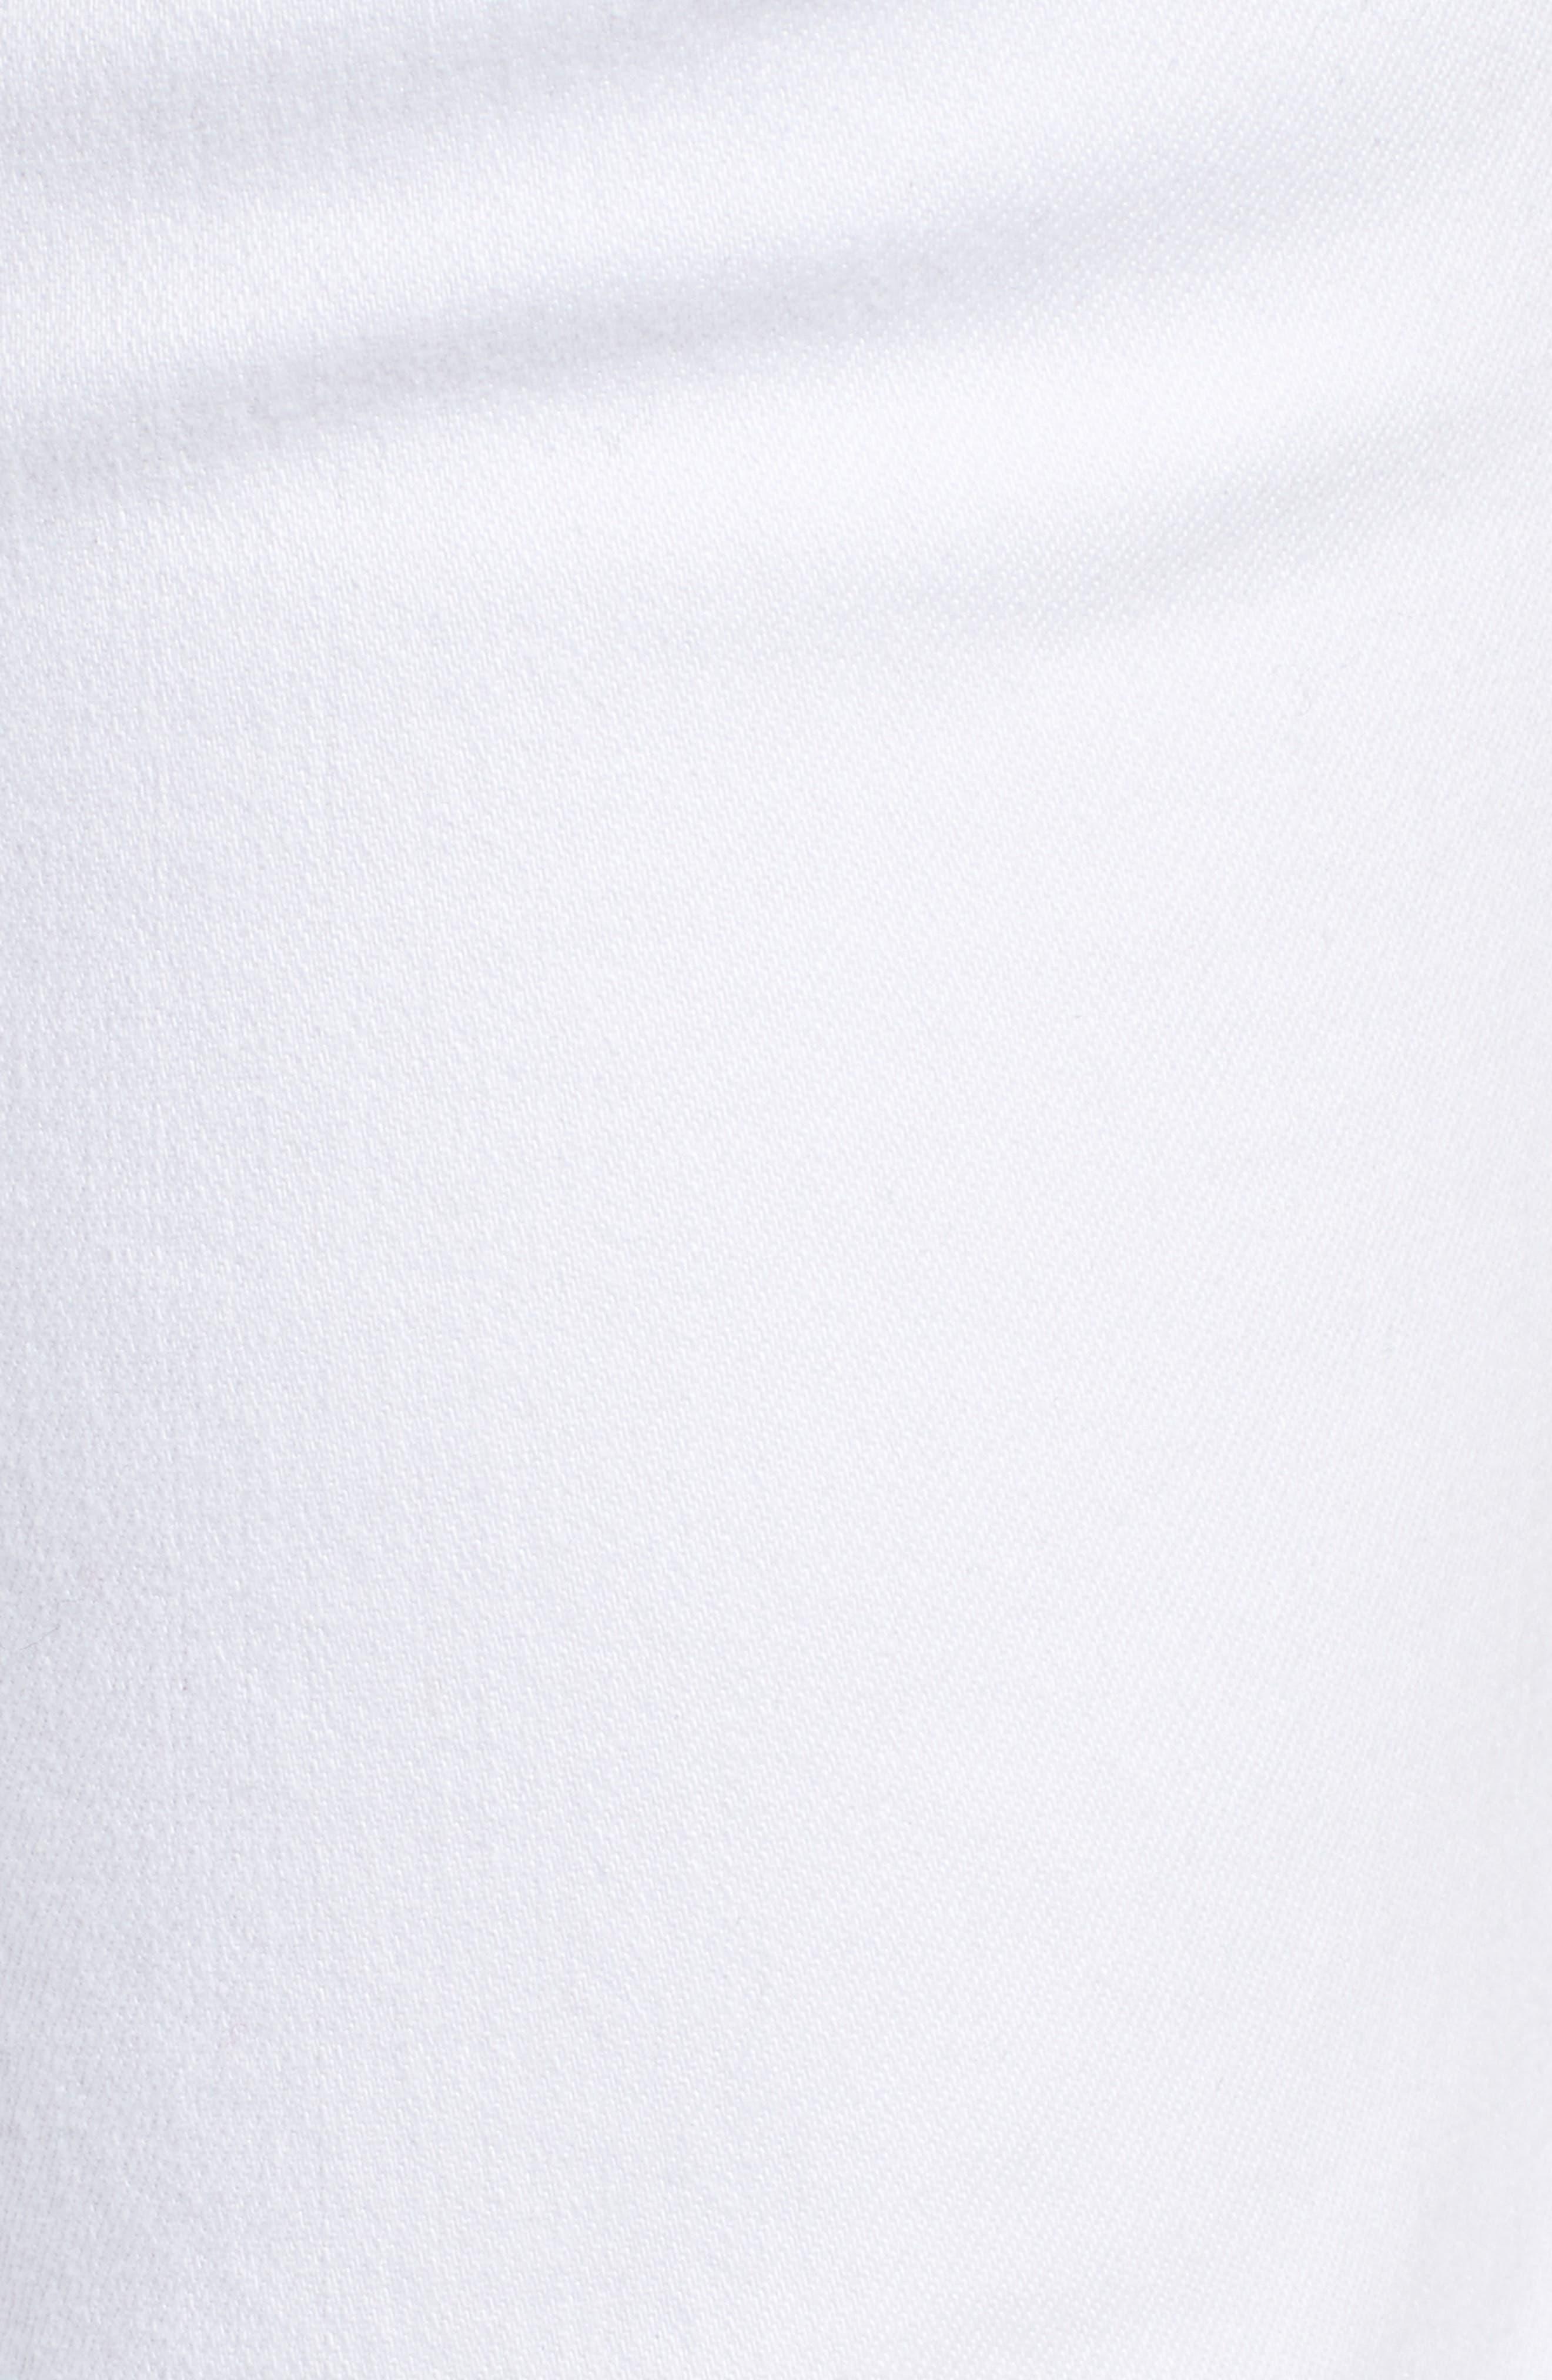 Catherine Stretch Boyfriend Jeans,                             Alternate thumbnail 6, color,                             White